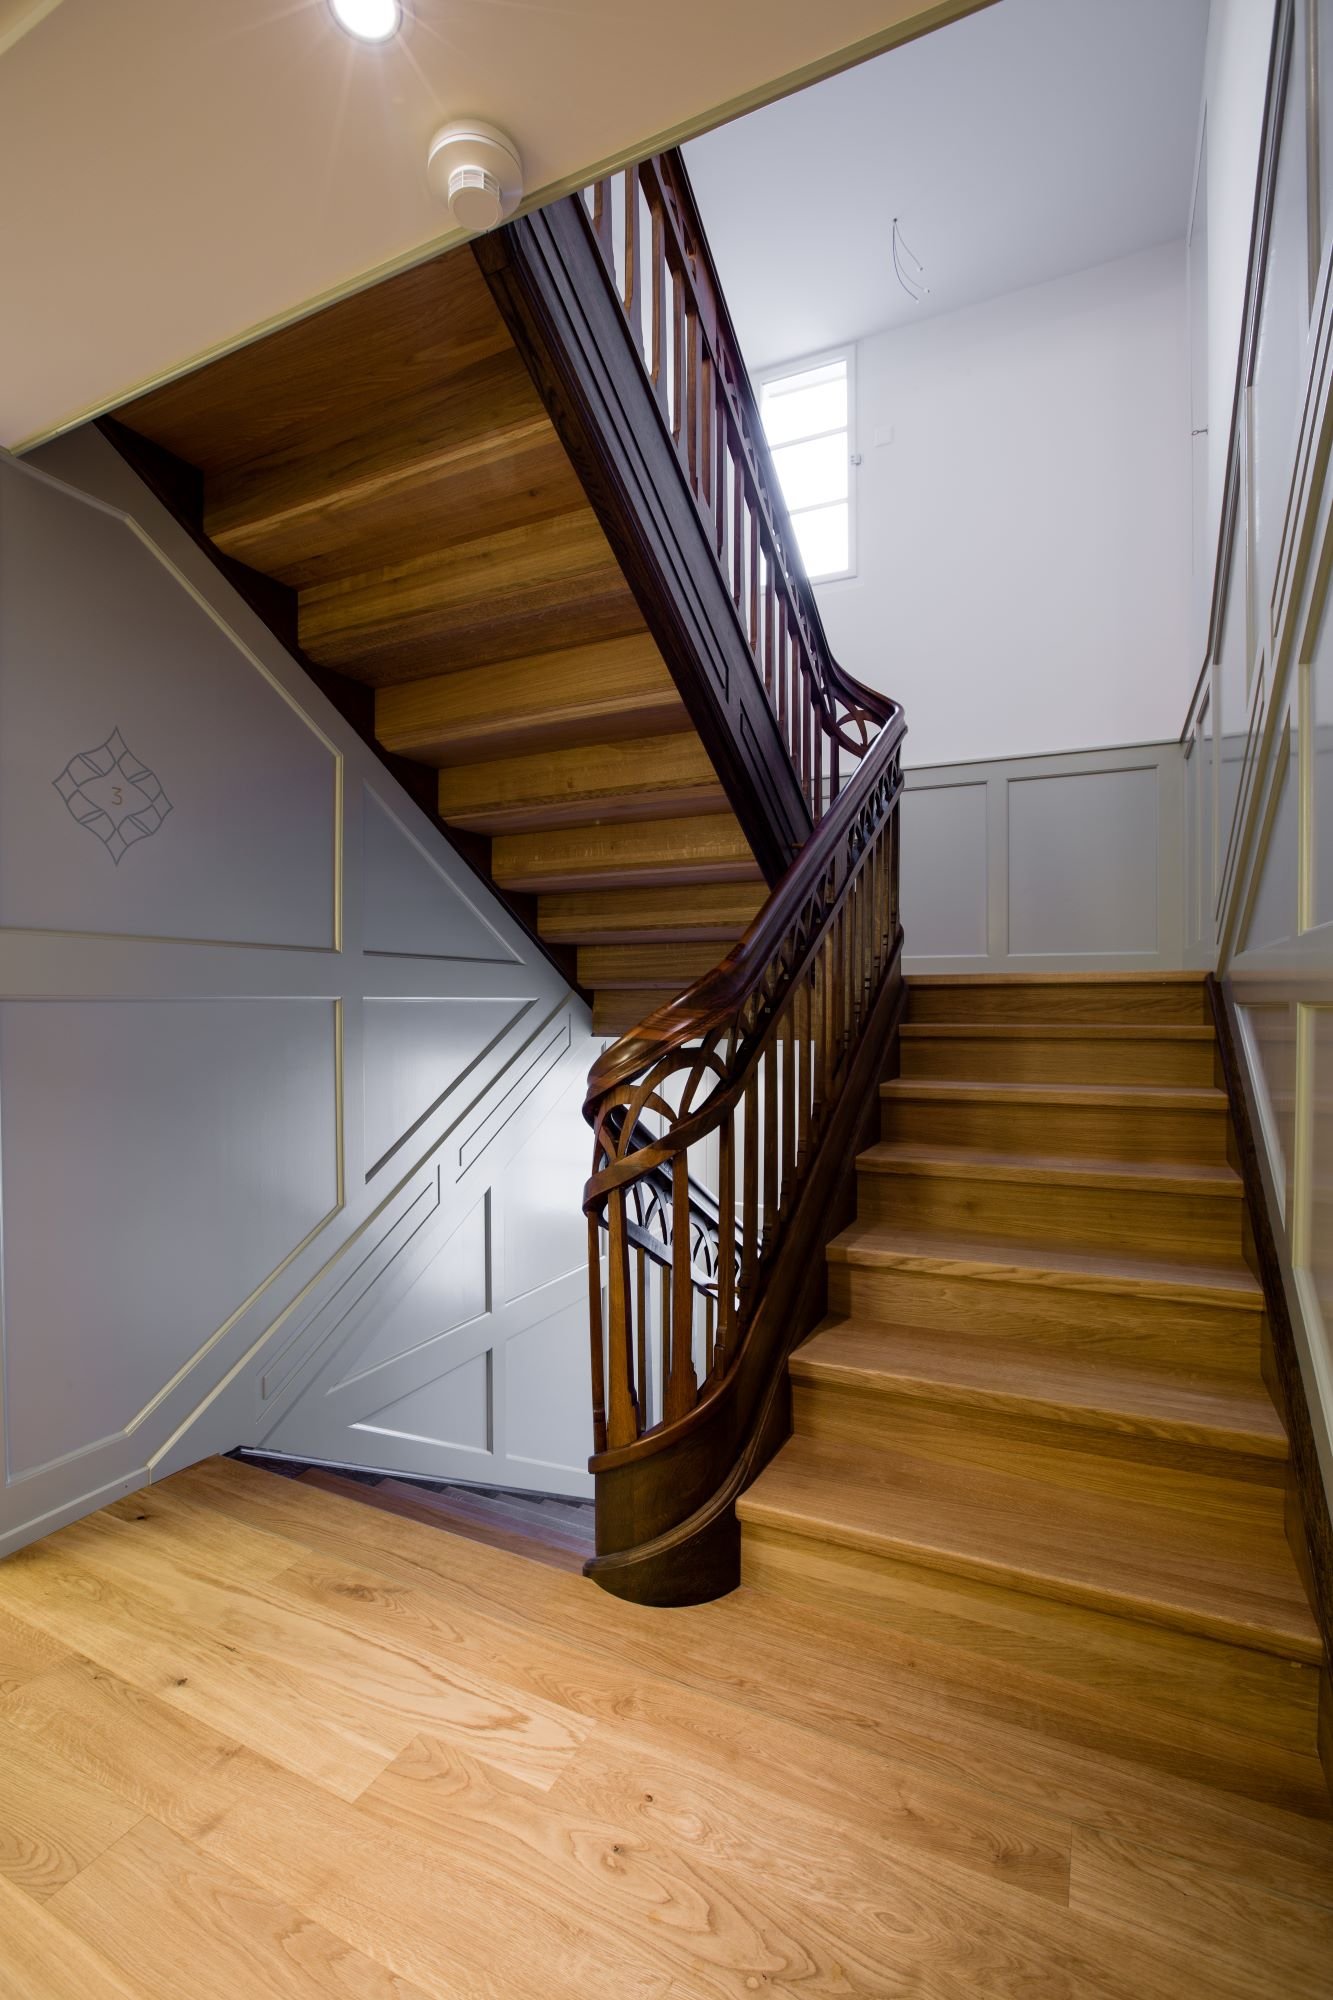 Stair Image 1282